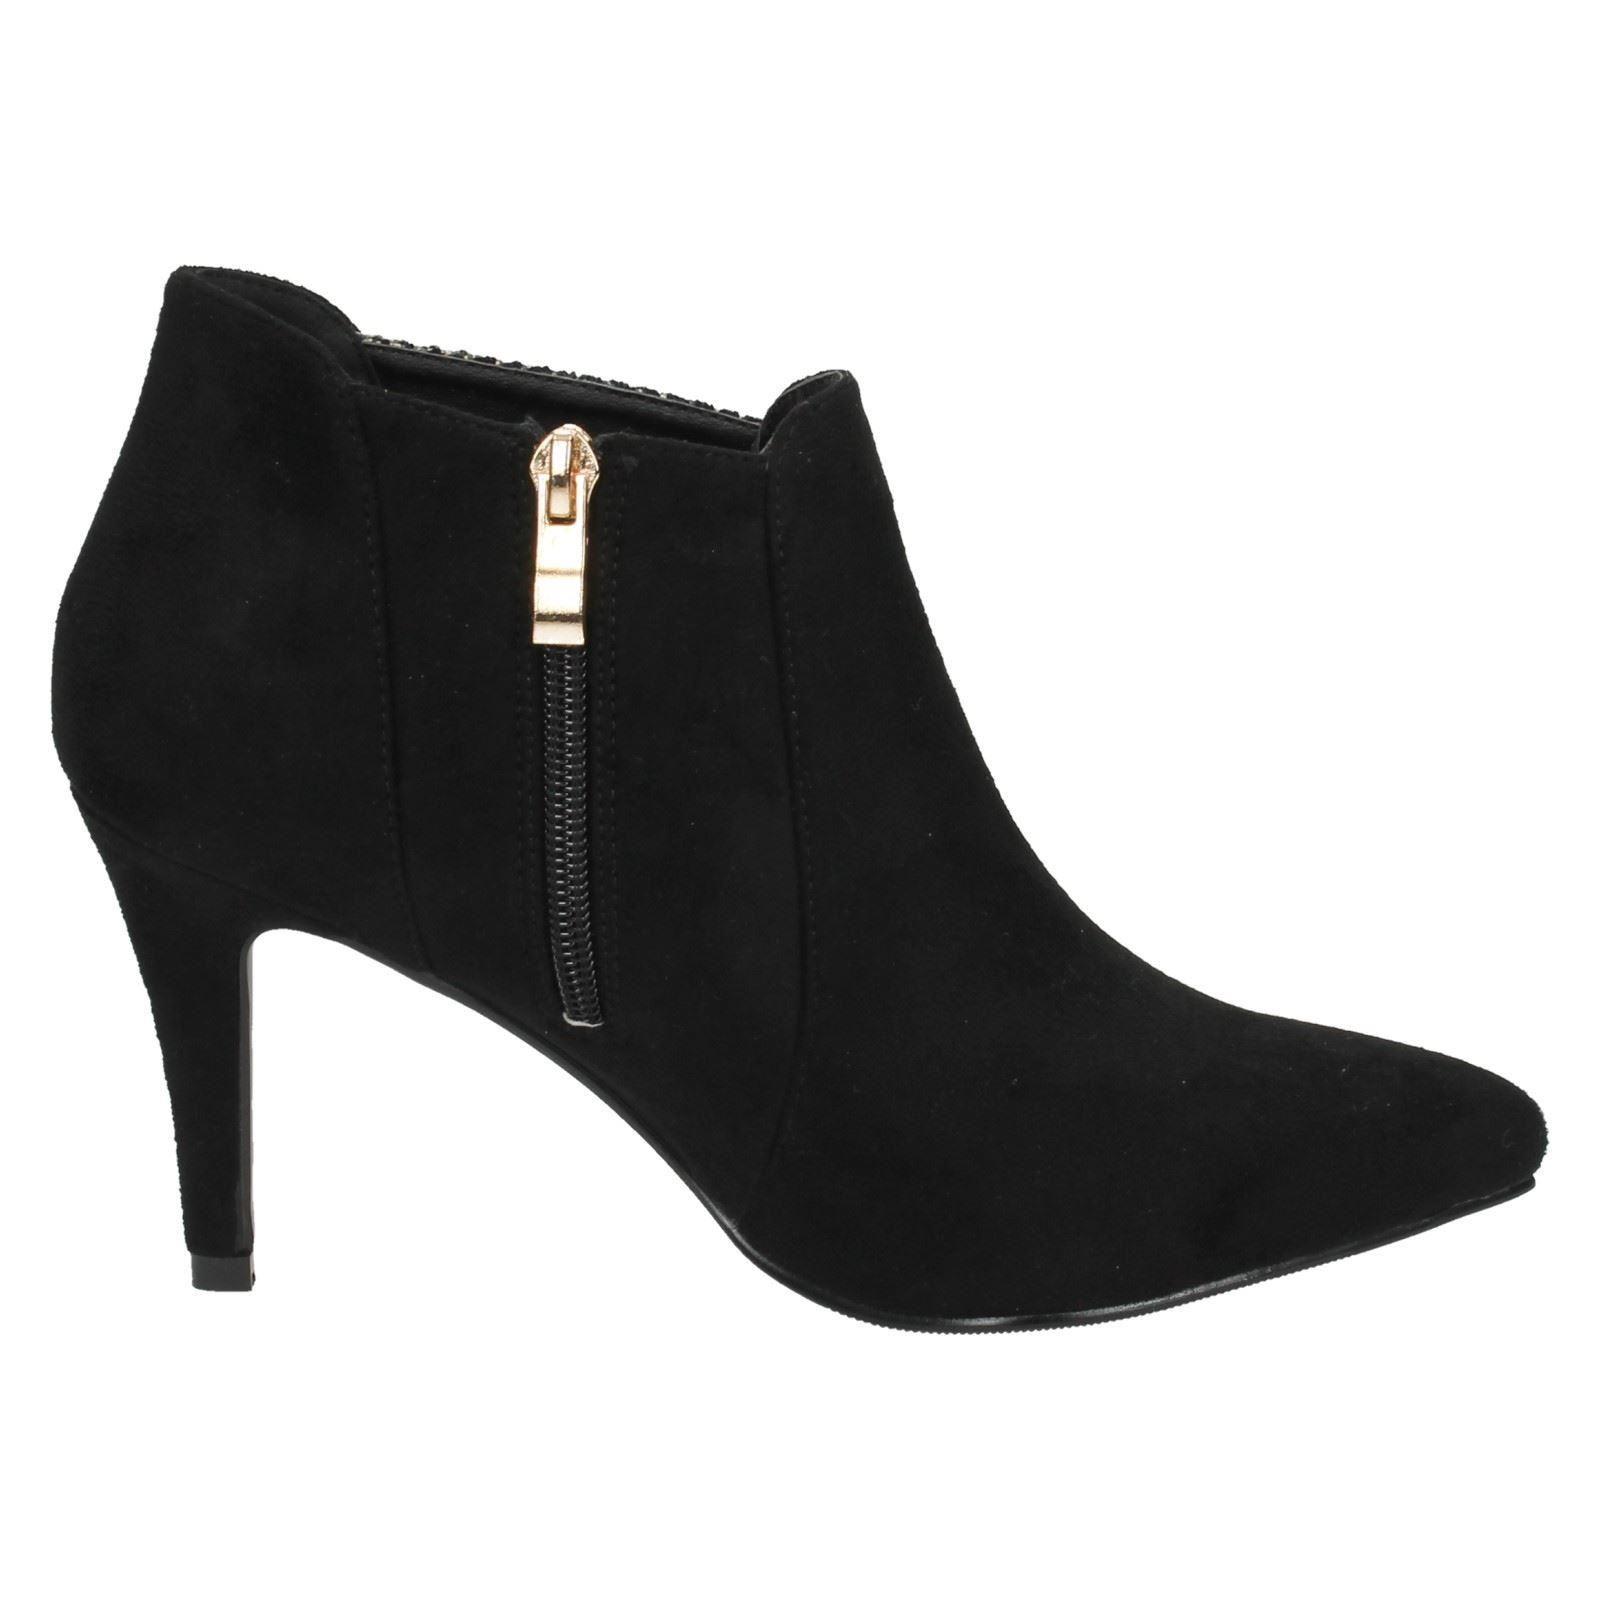 Ladies Anne Michelle Ankle Boots